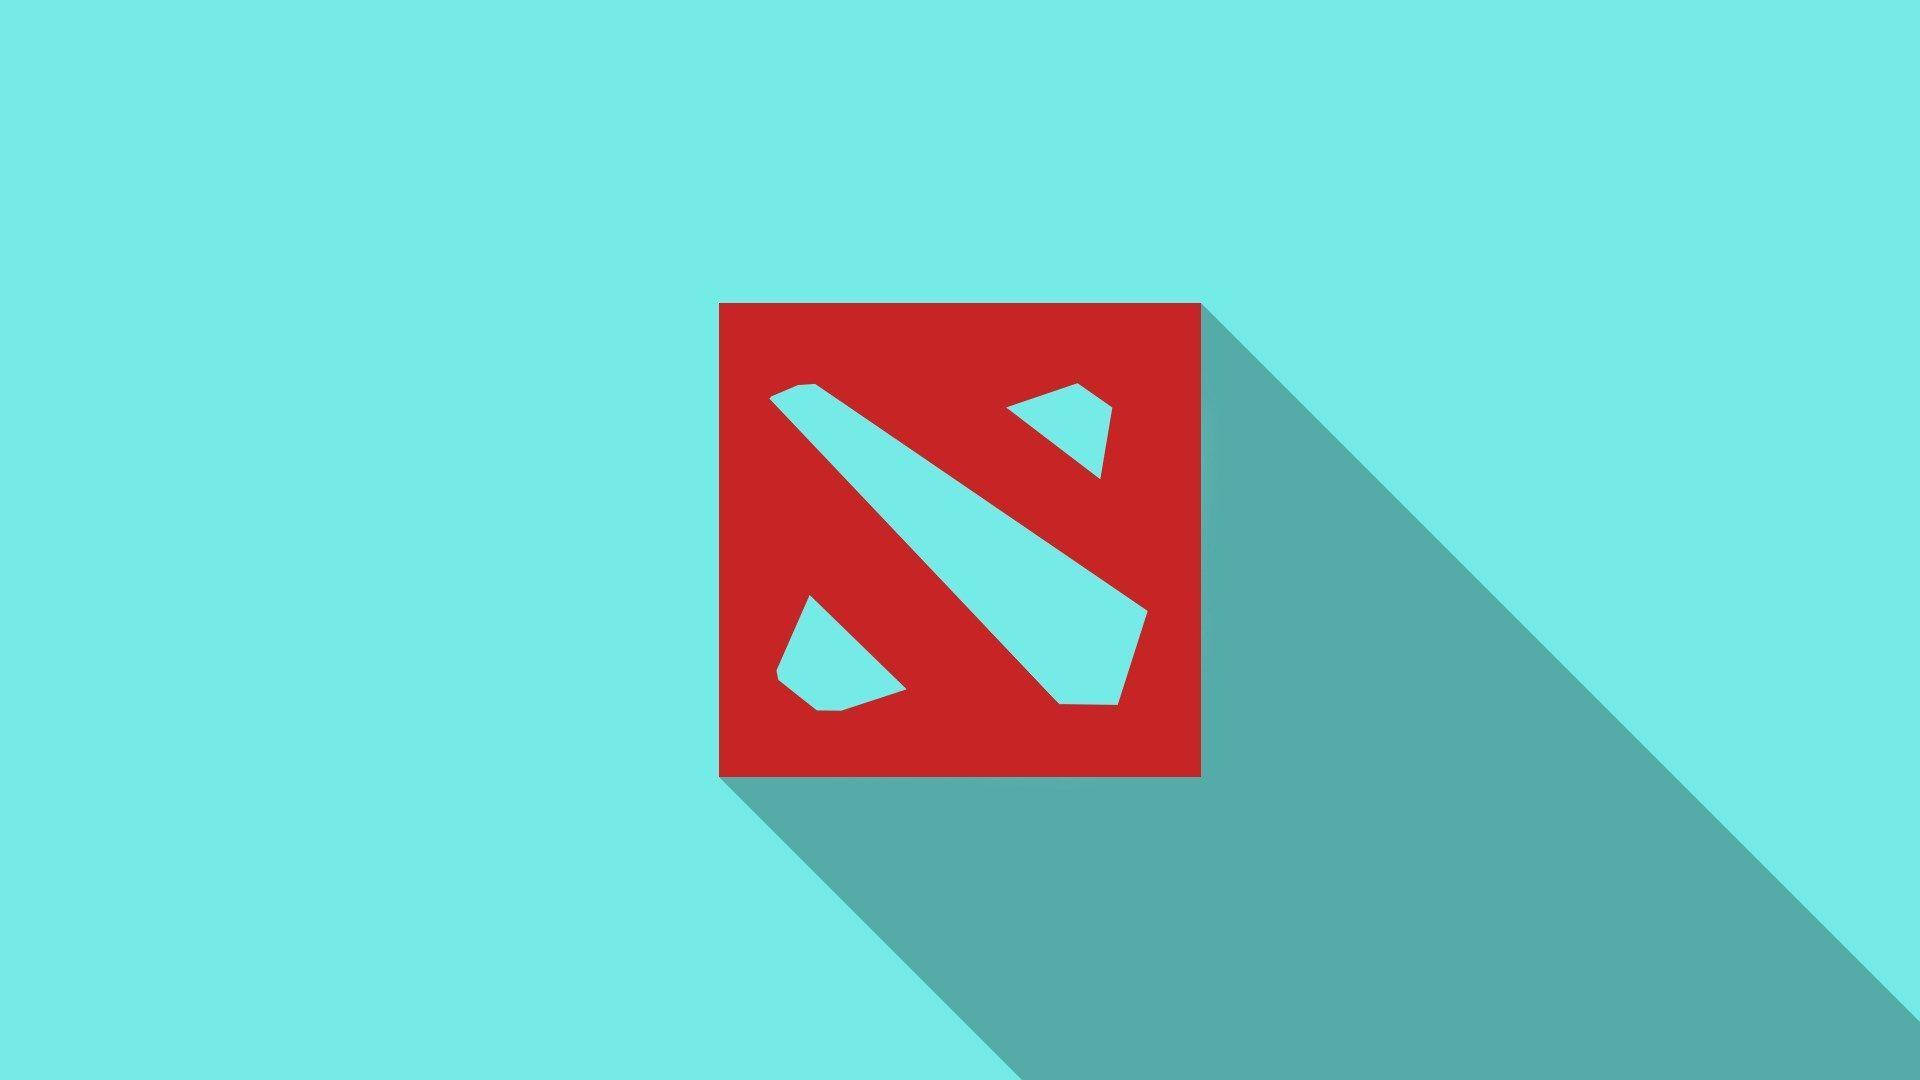 dota 2 logo minimal ololoshenka dota 2 dota 2 wallpaper dota 2